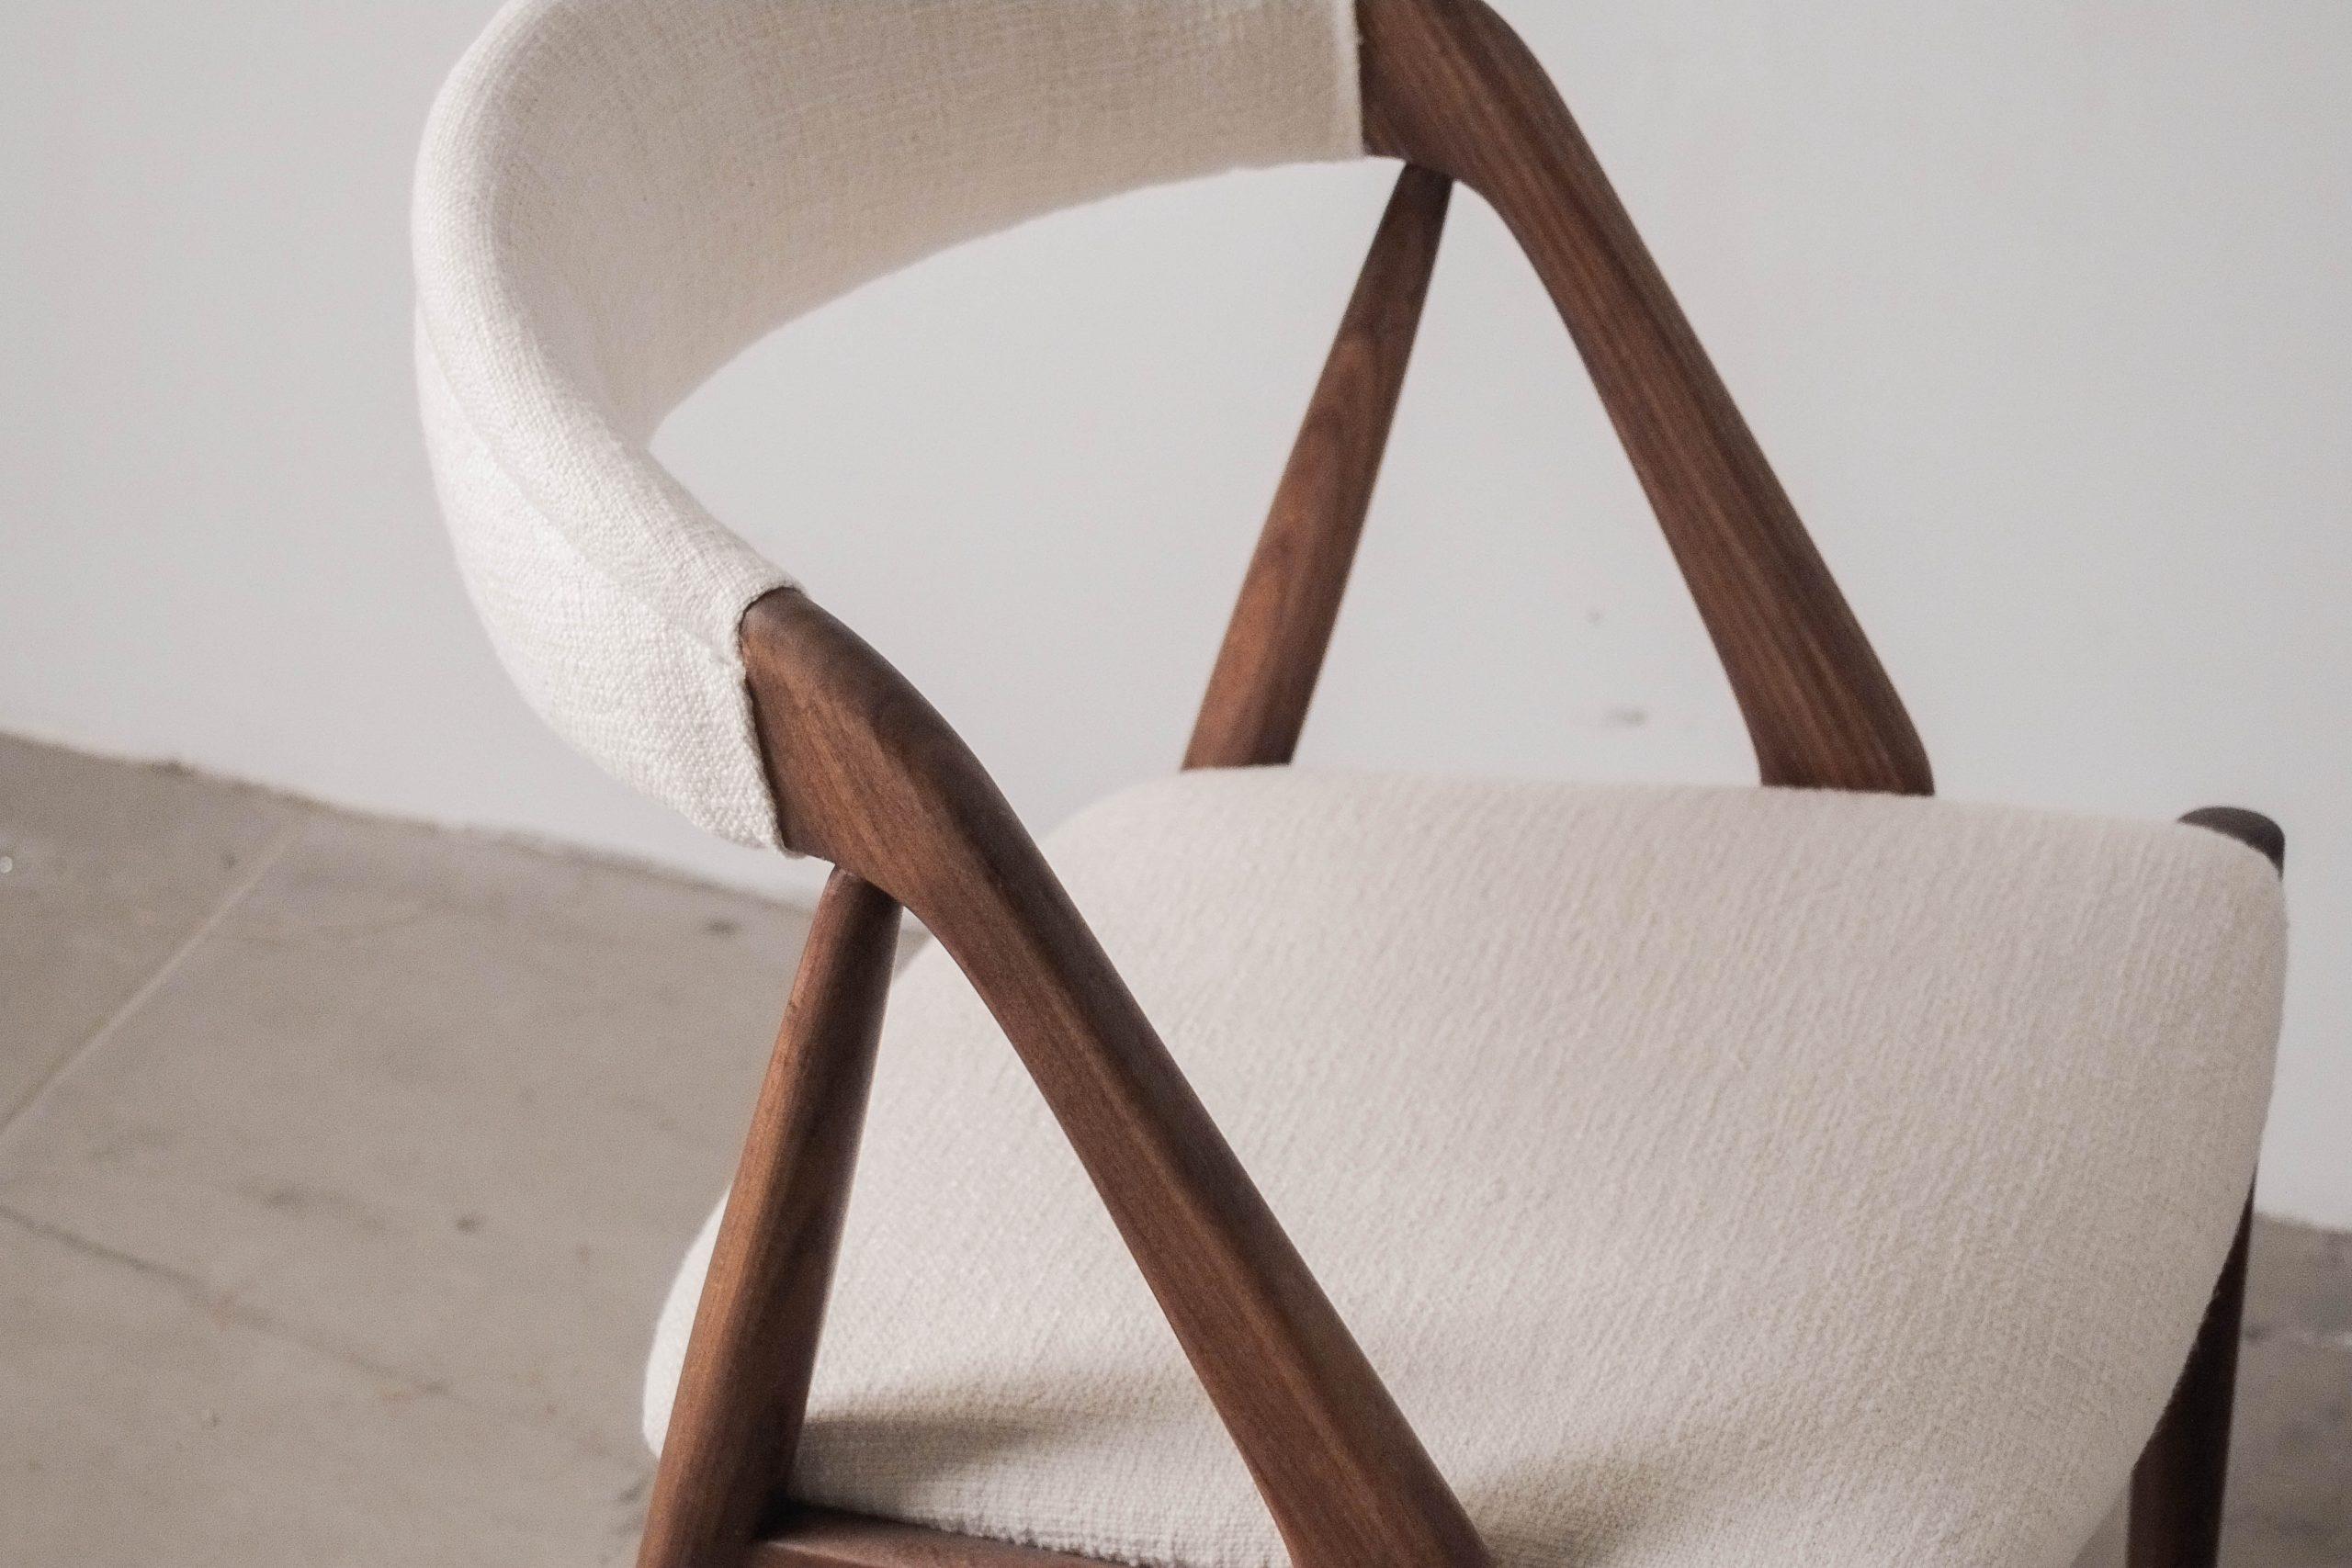 silla de diseño vintage kai kristiansen calidad madera maciza